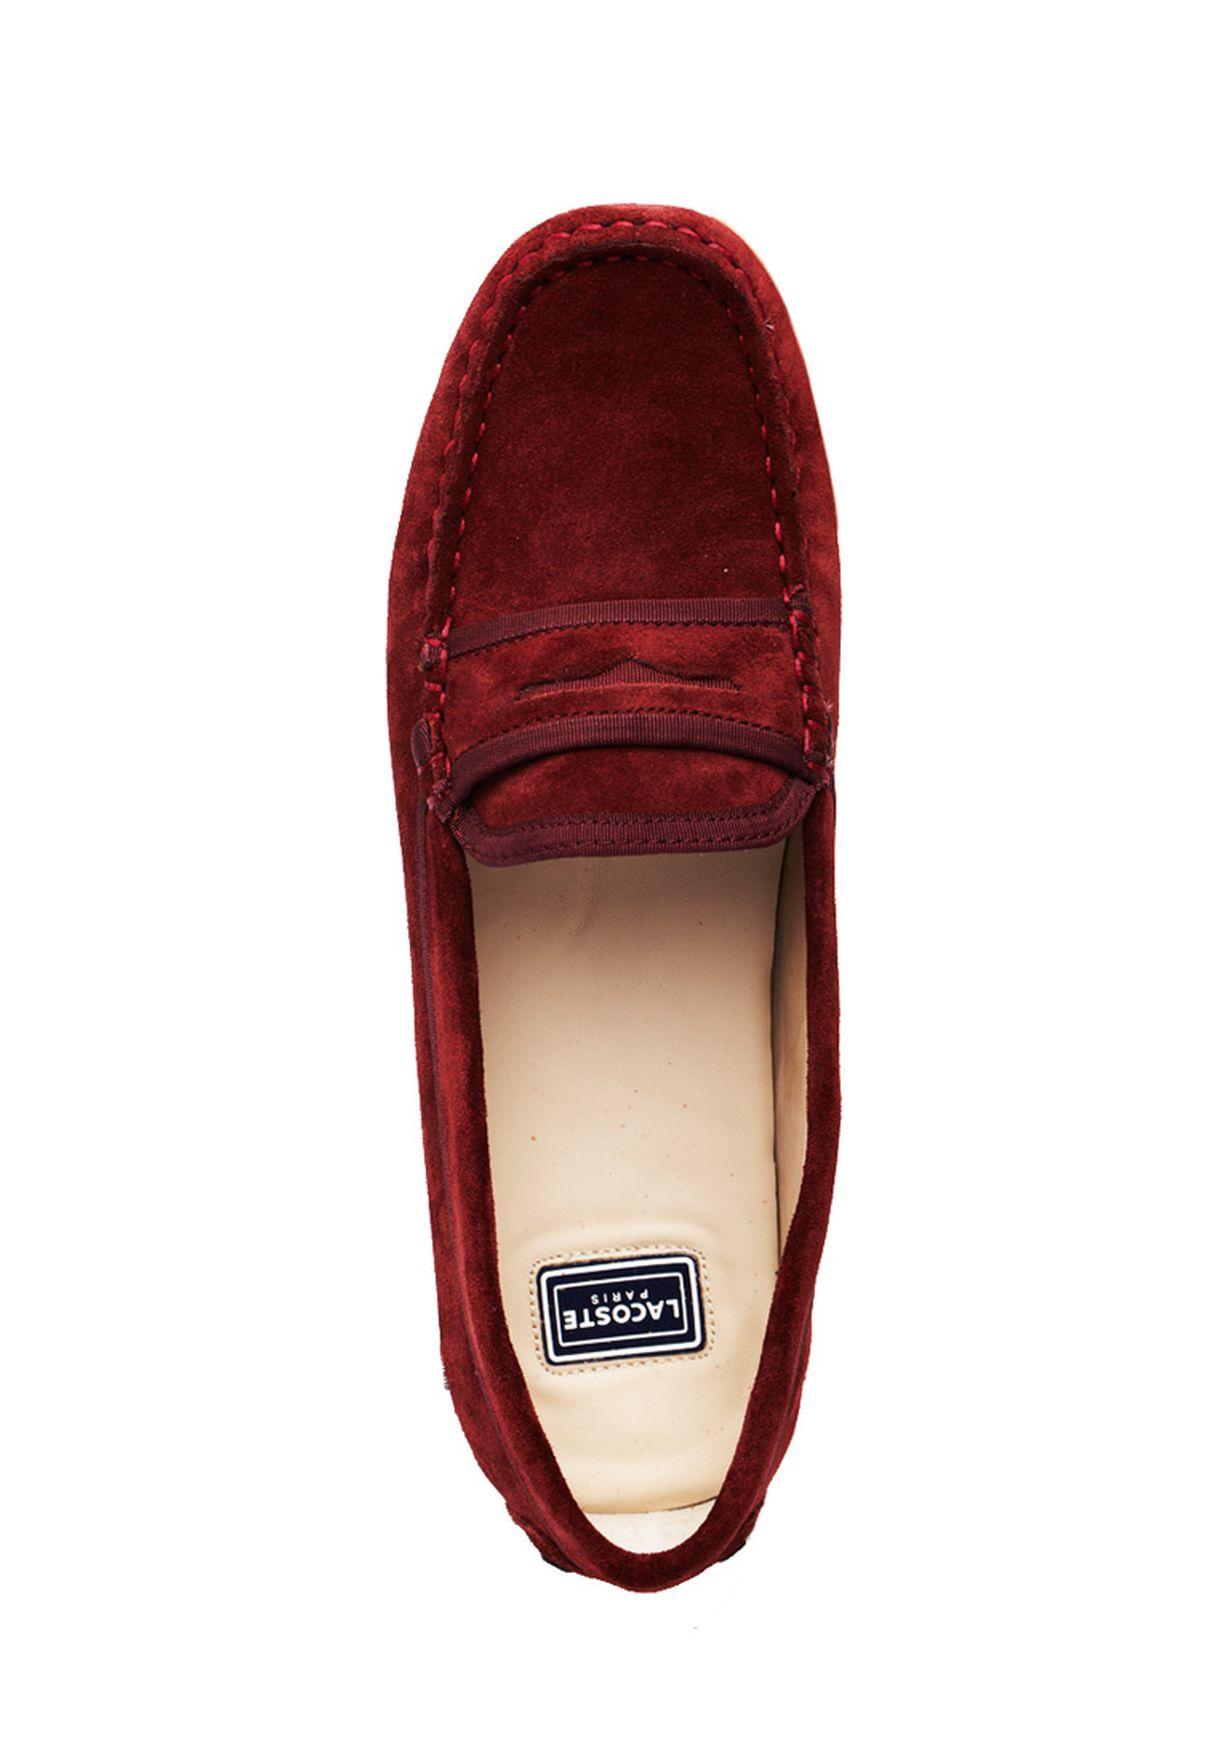 3c986b6fd312d5 Shop Lacoste browns Concours Moccasin Shoes 24CLW0028-FD8 for Women ...